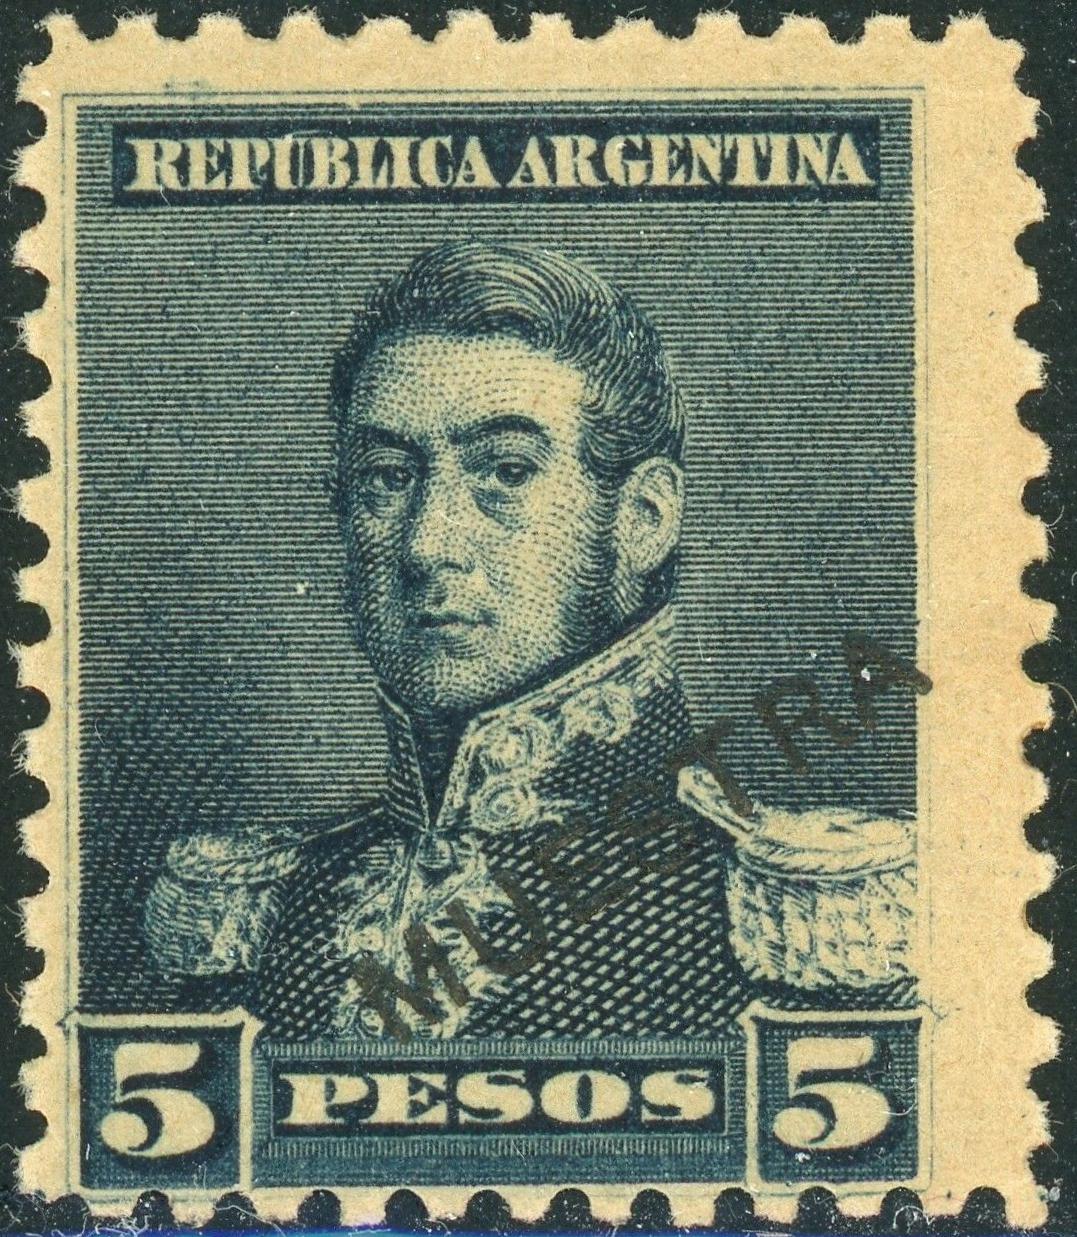 Argentina - Scott #126s (1896) with